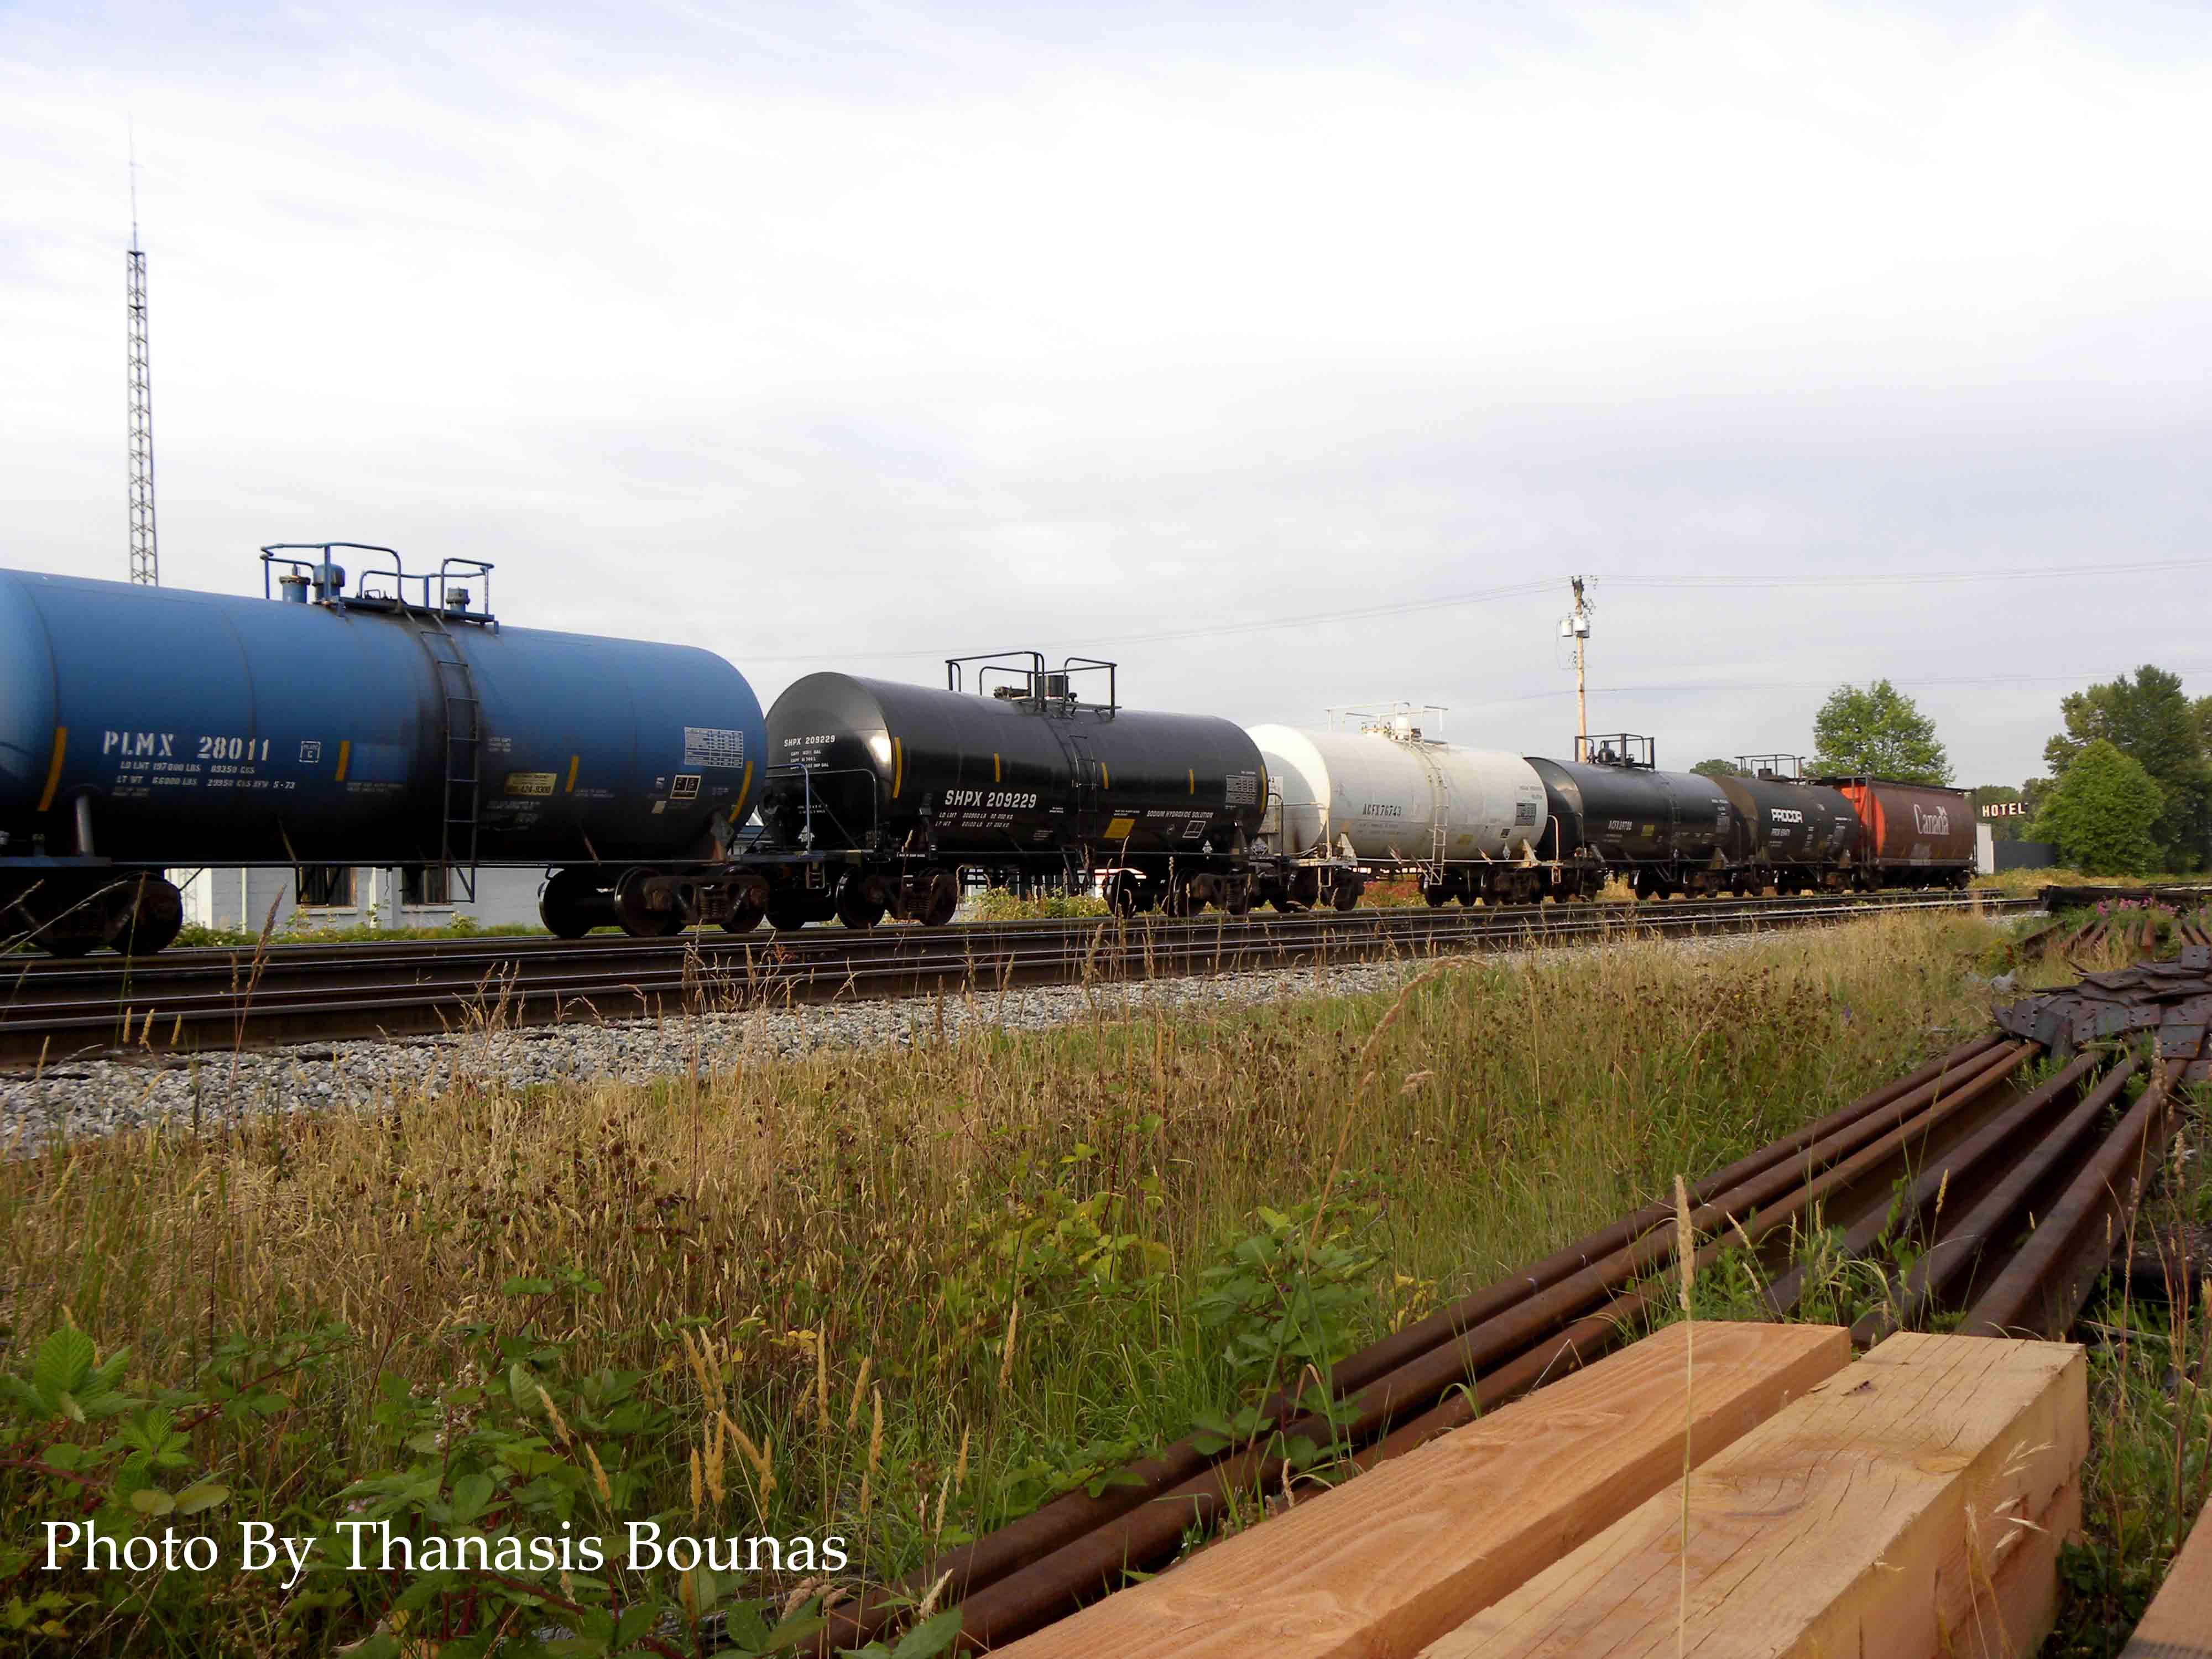 6 Trains Beautiful British Columbia Photo By Thanasis Bounas